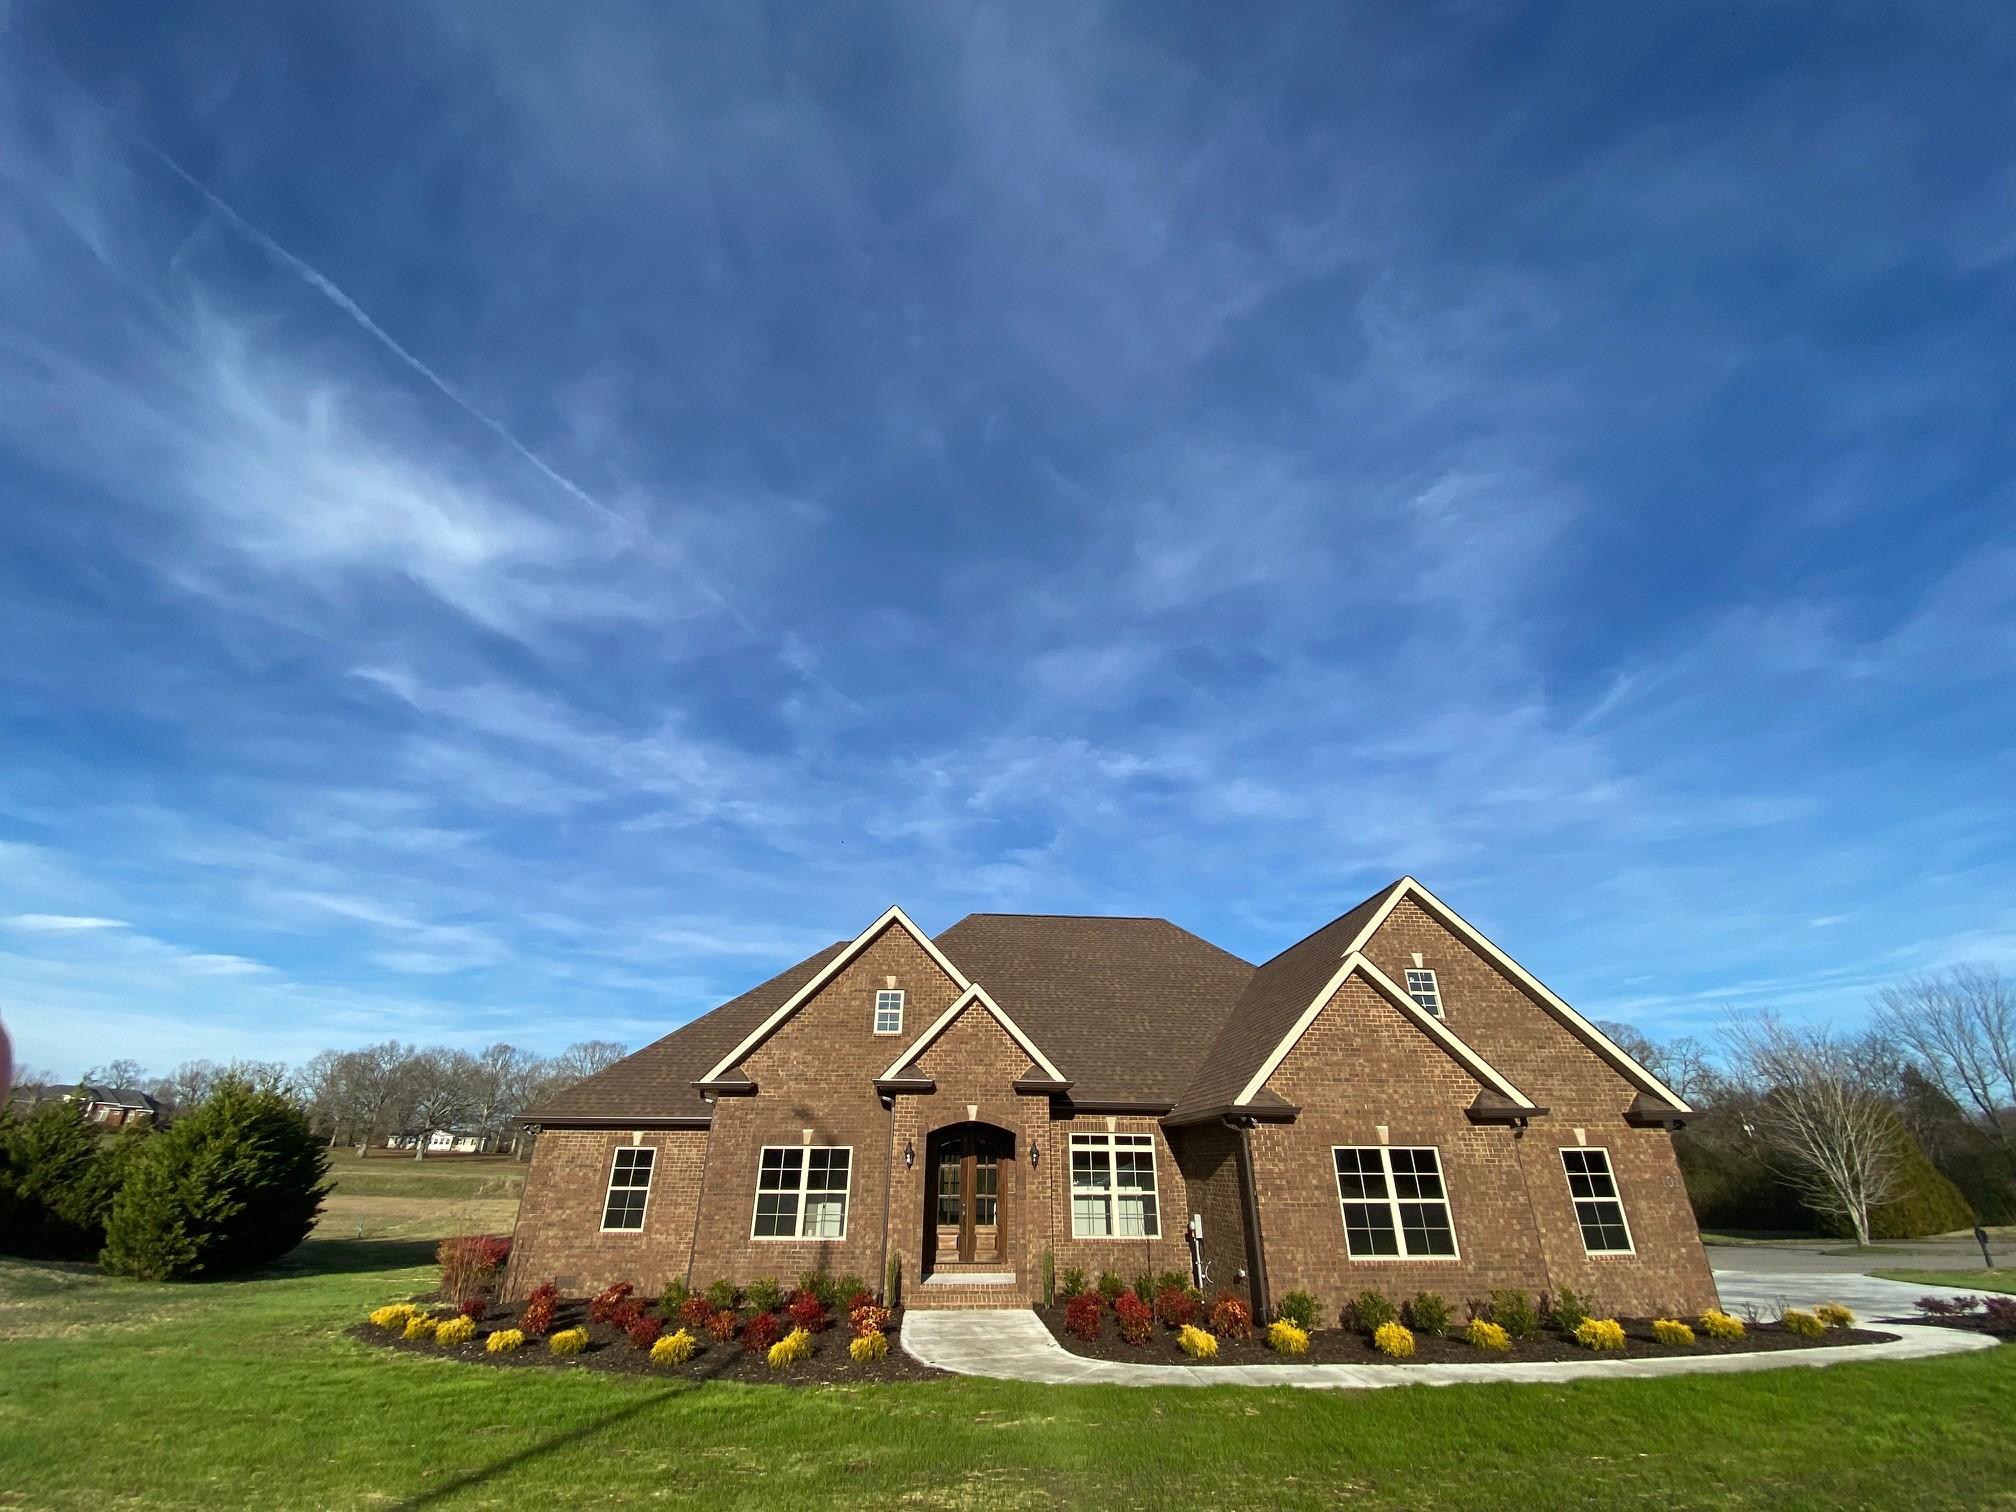 101N Victoria Court, Tullahoma, TN 37388 - Tullahoma, TN real estate listing